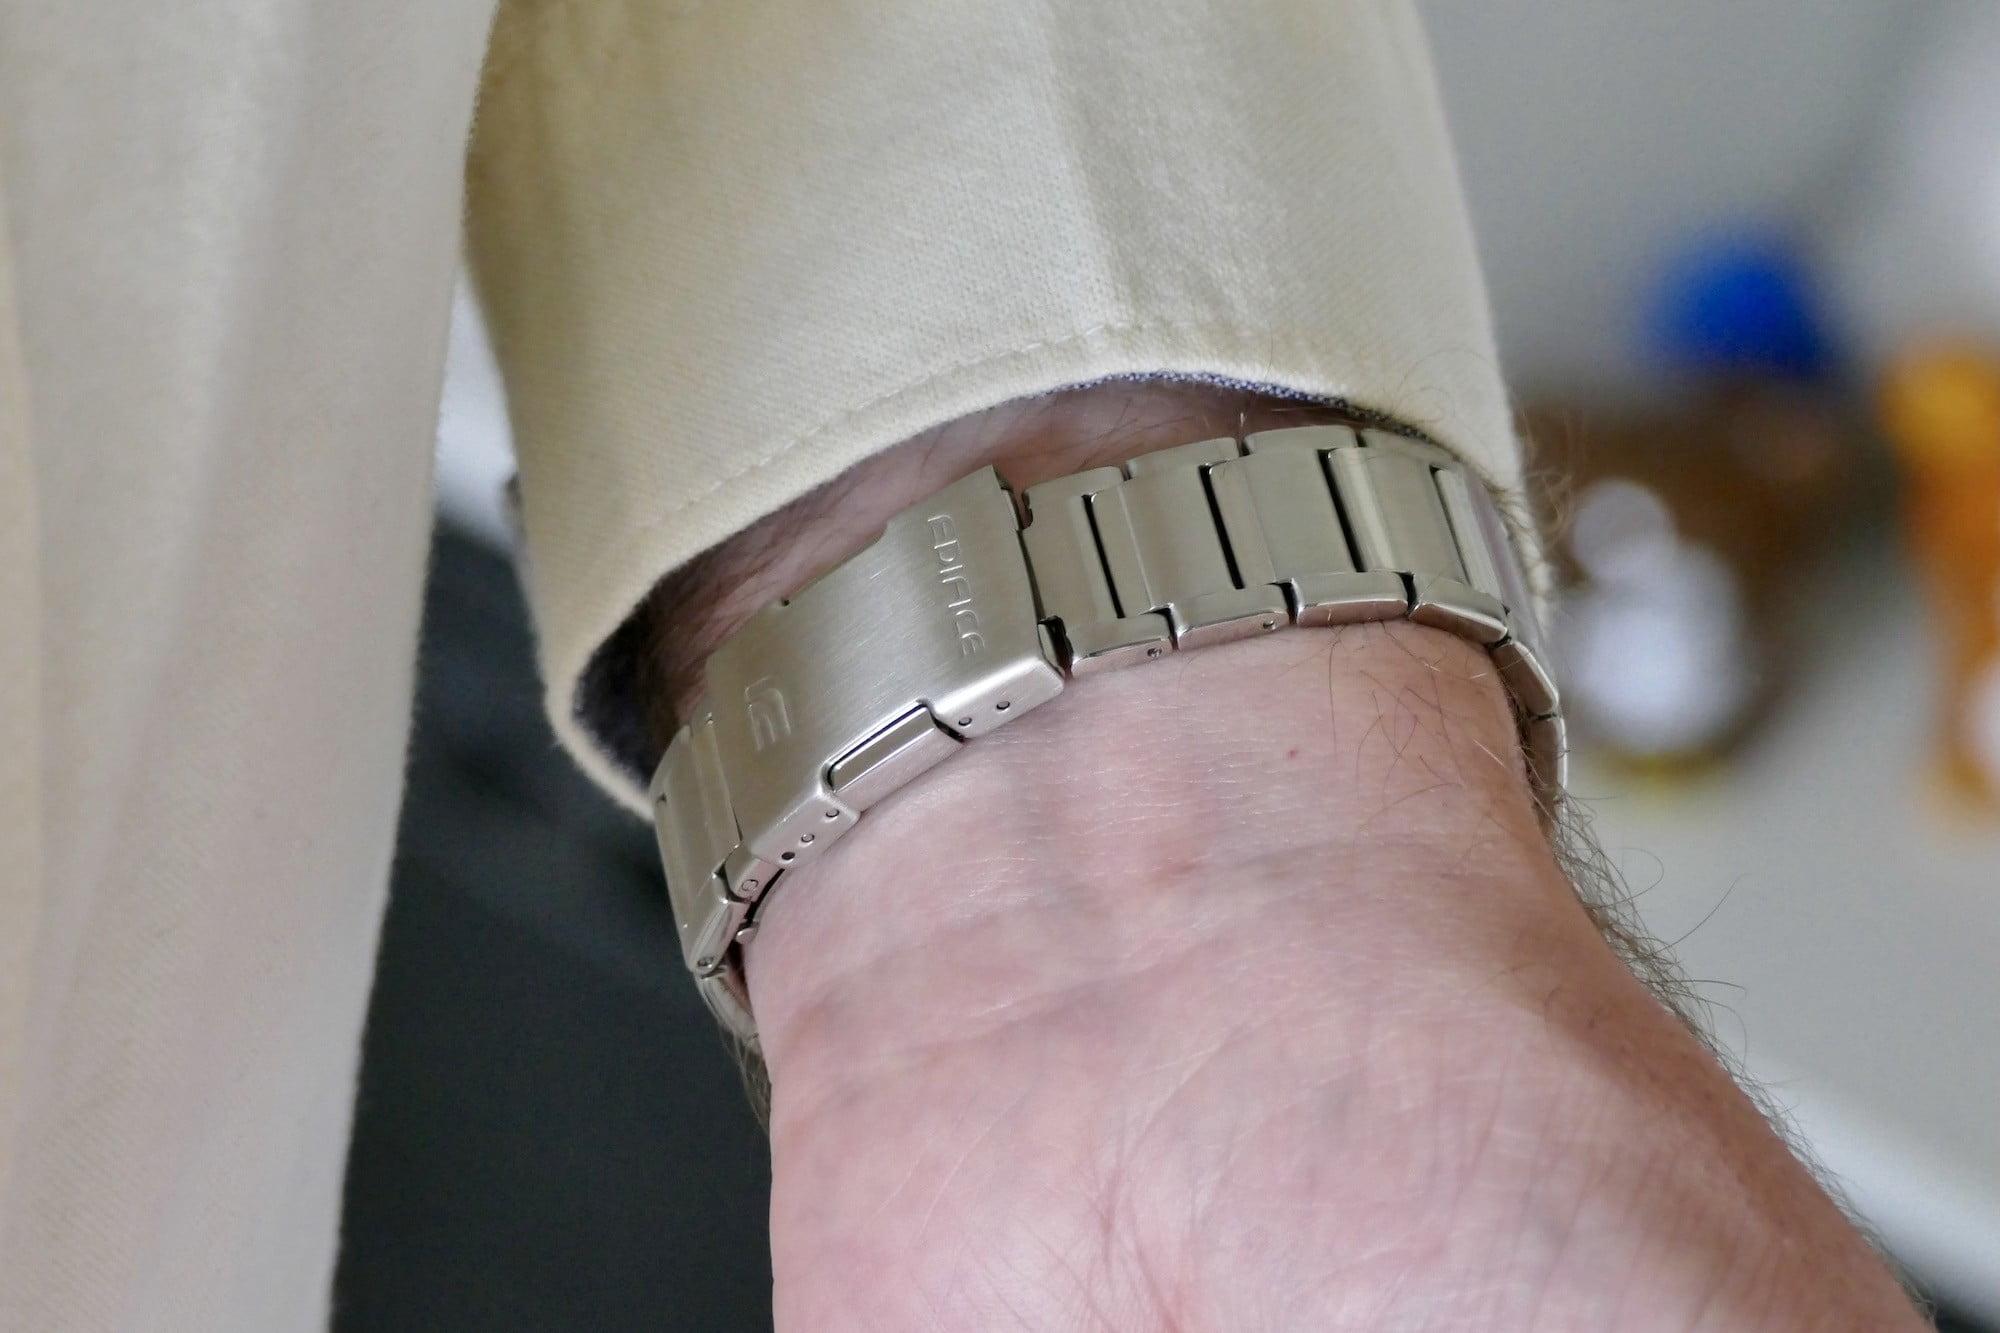 The bracelet clasp on the Casio Edifice EQB-1100.